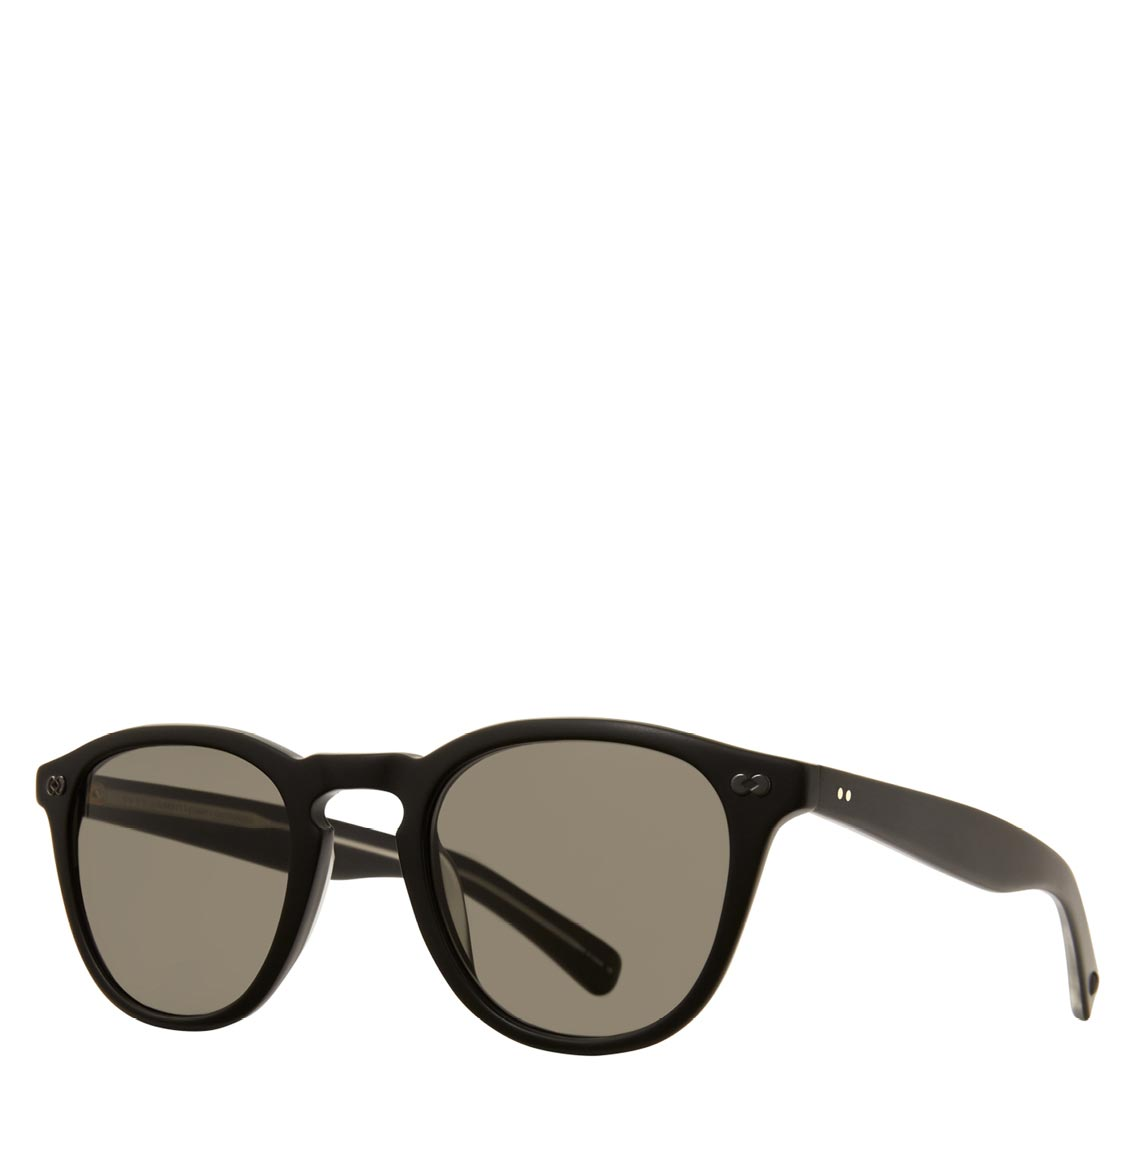 Garrett Leight Square Matte Black Γυαλιά Ηλίου Anniversary Edition